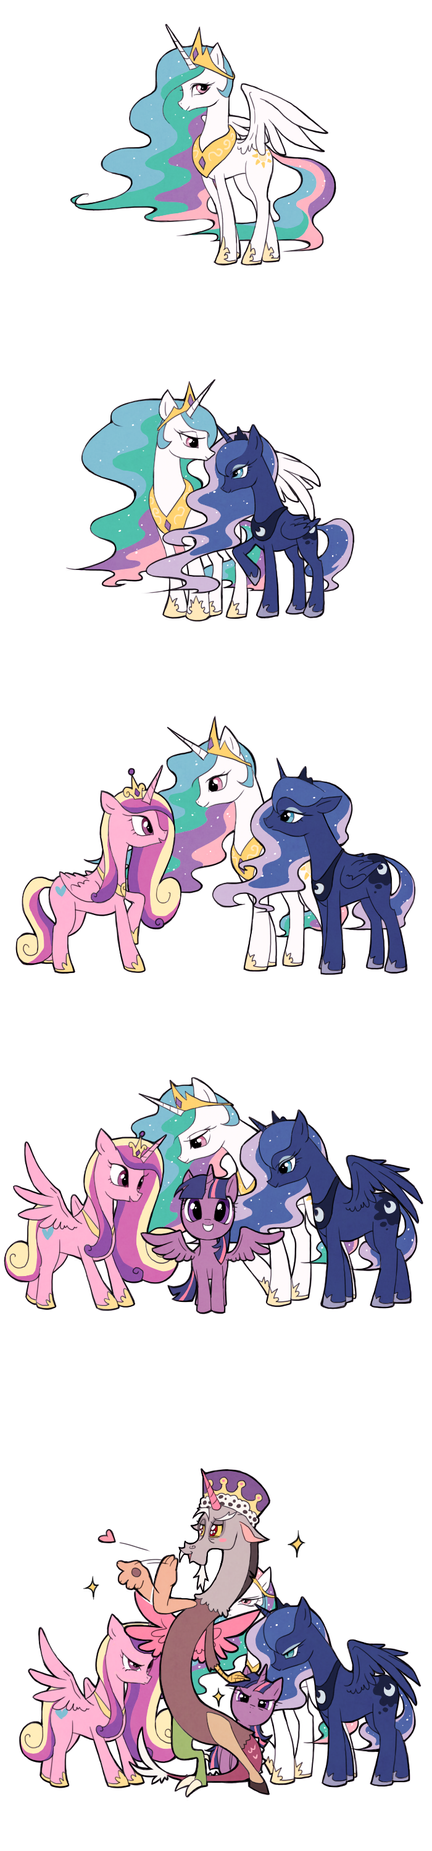 Alicorn Princess by Ssalbug